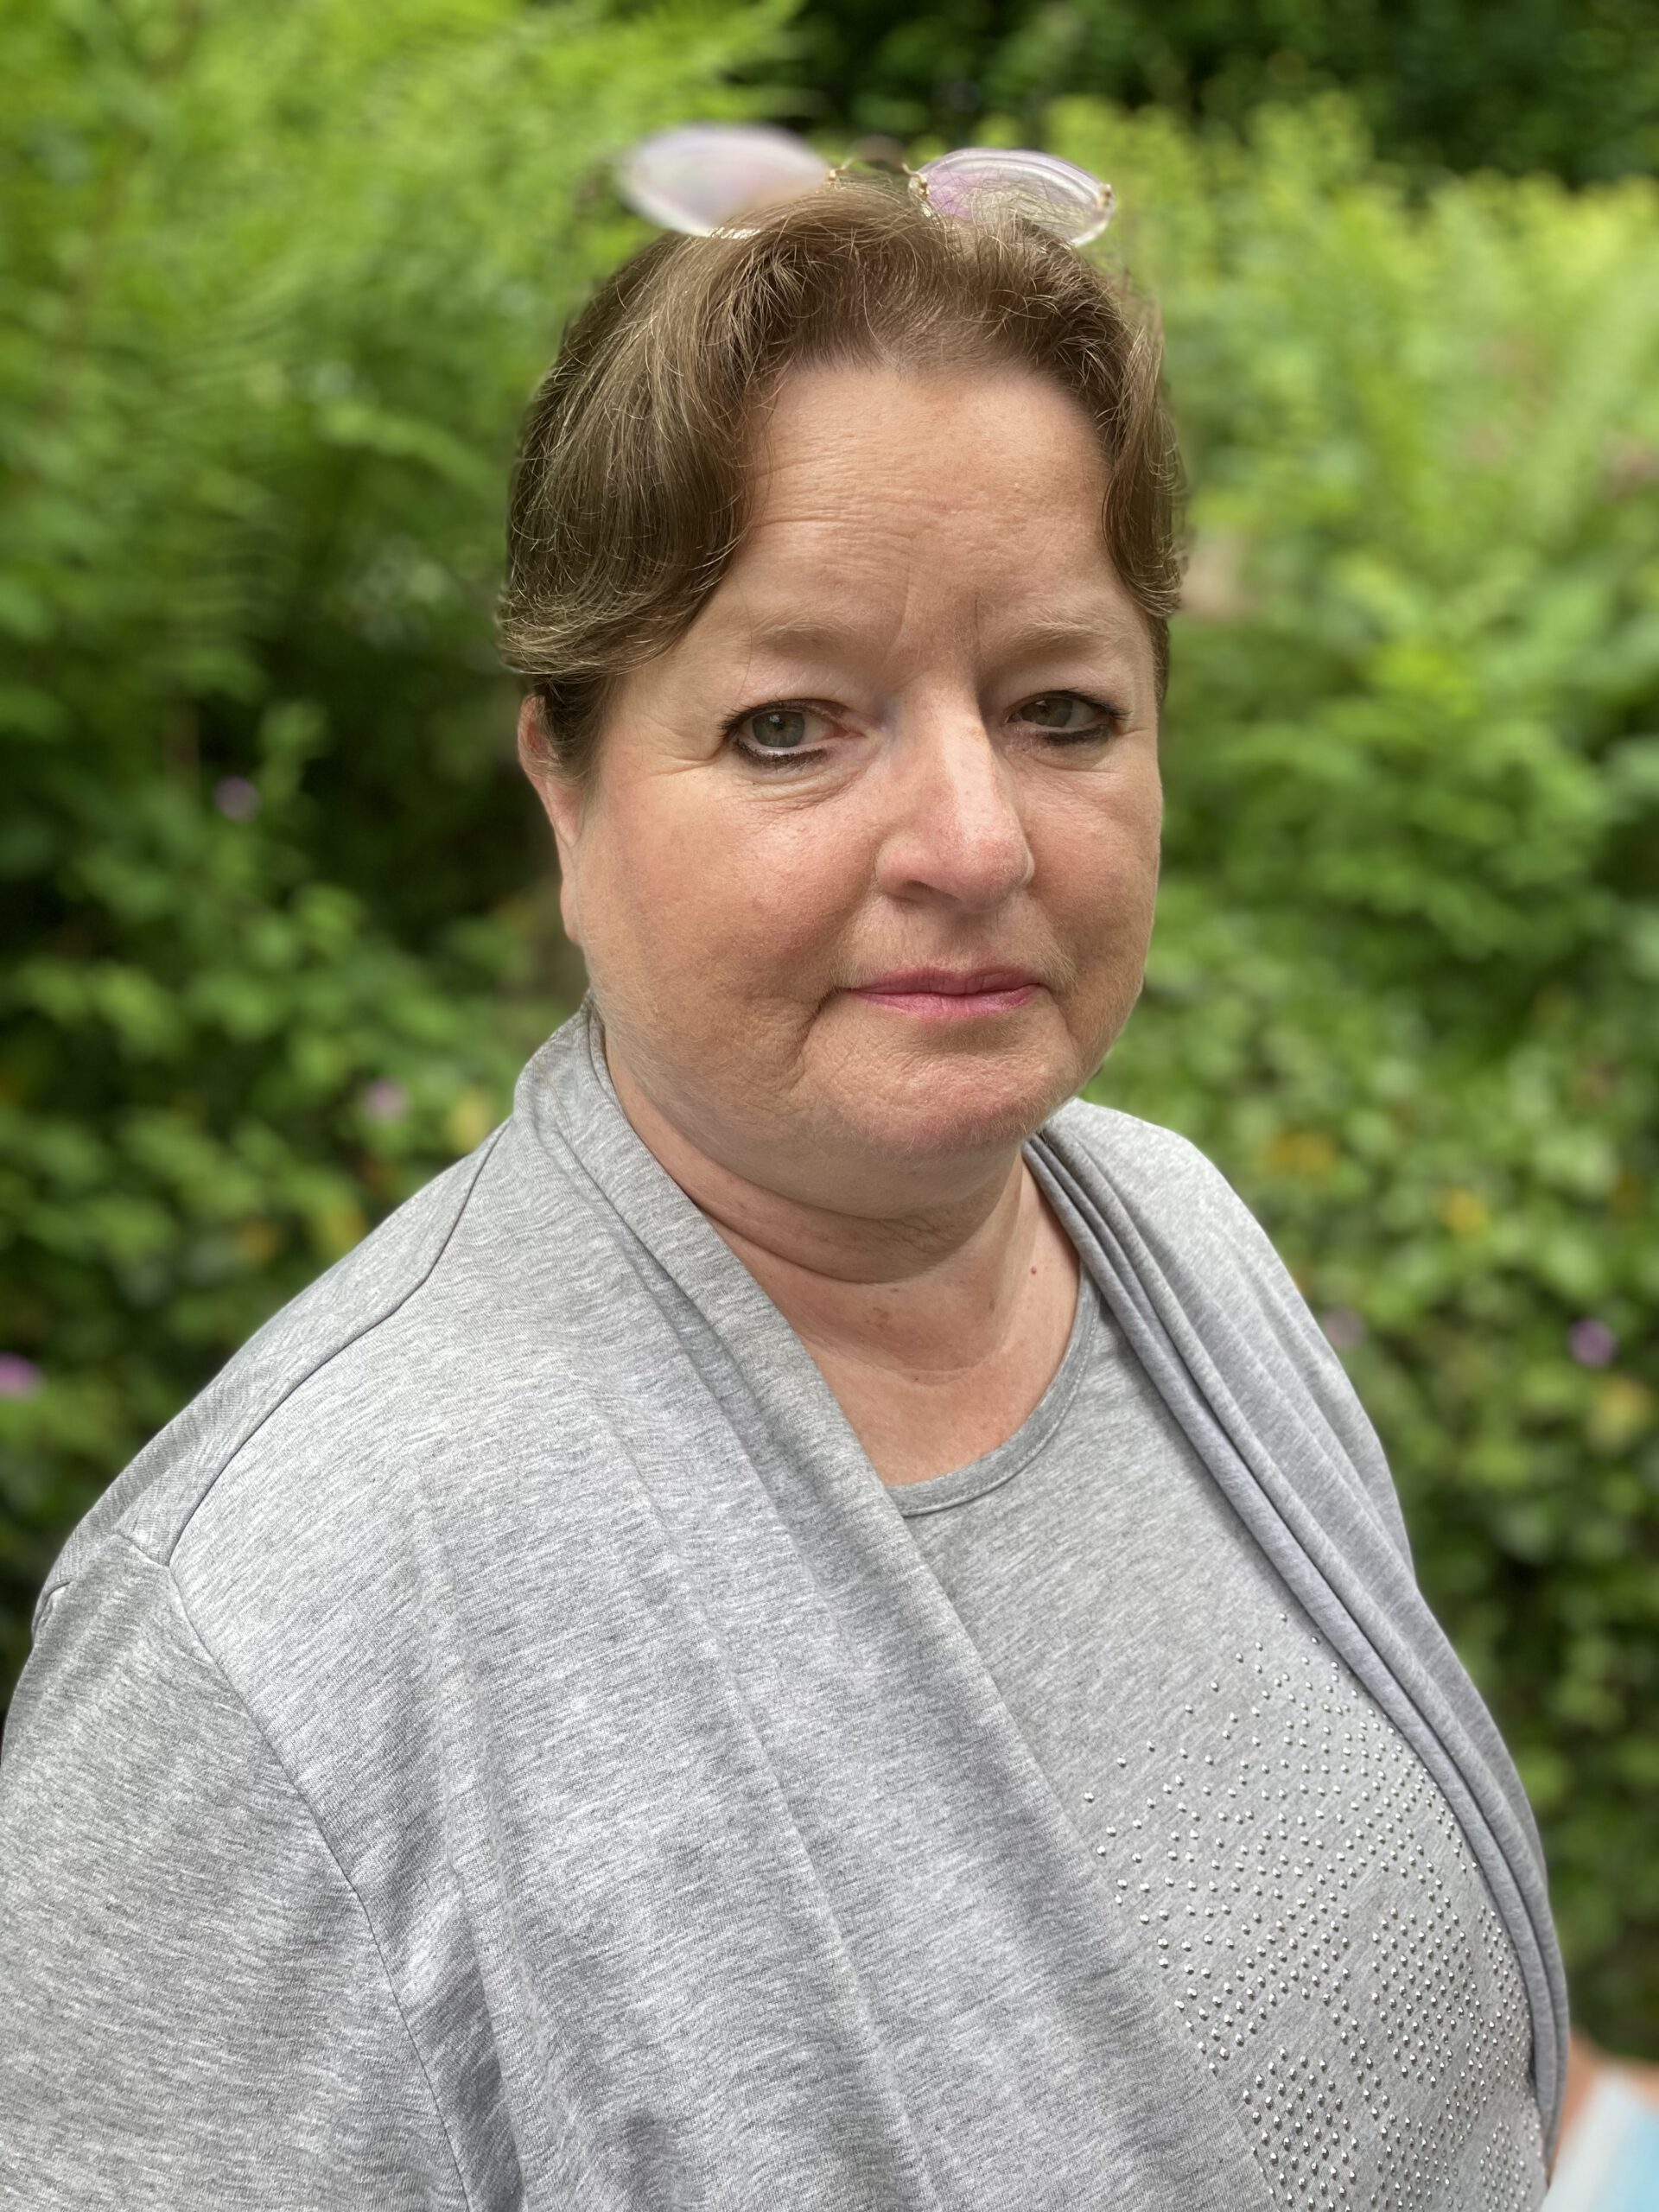 Dagmar Kreider-Kockel